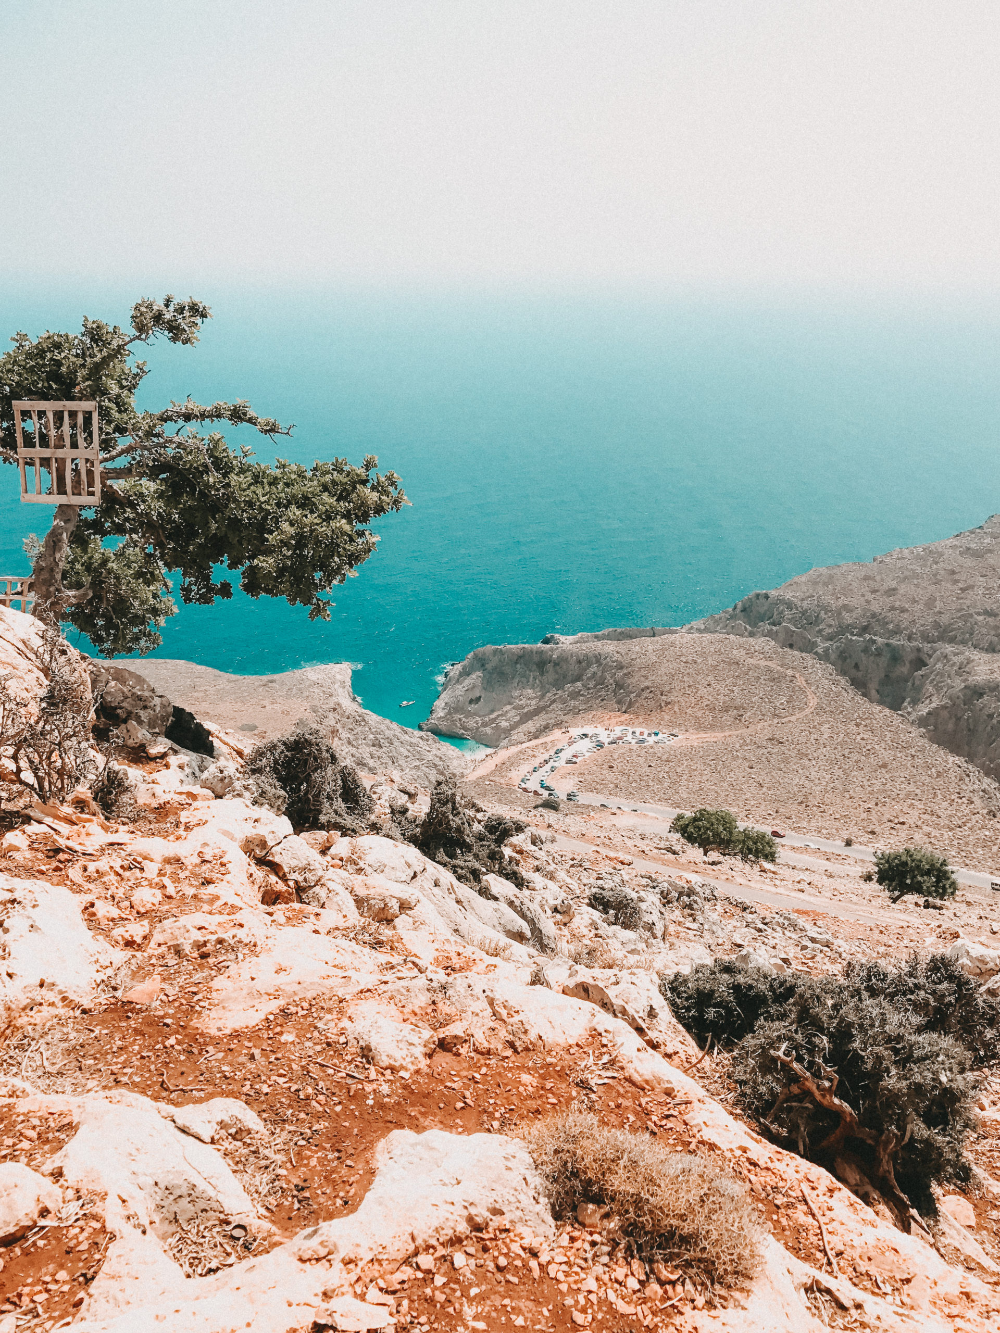 Top Strande Auf Kreta In 2020 Kreta Kreta Strande Strand